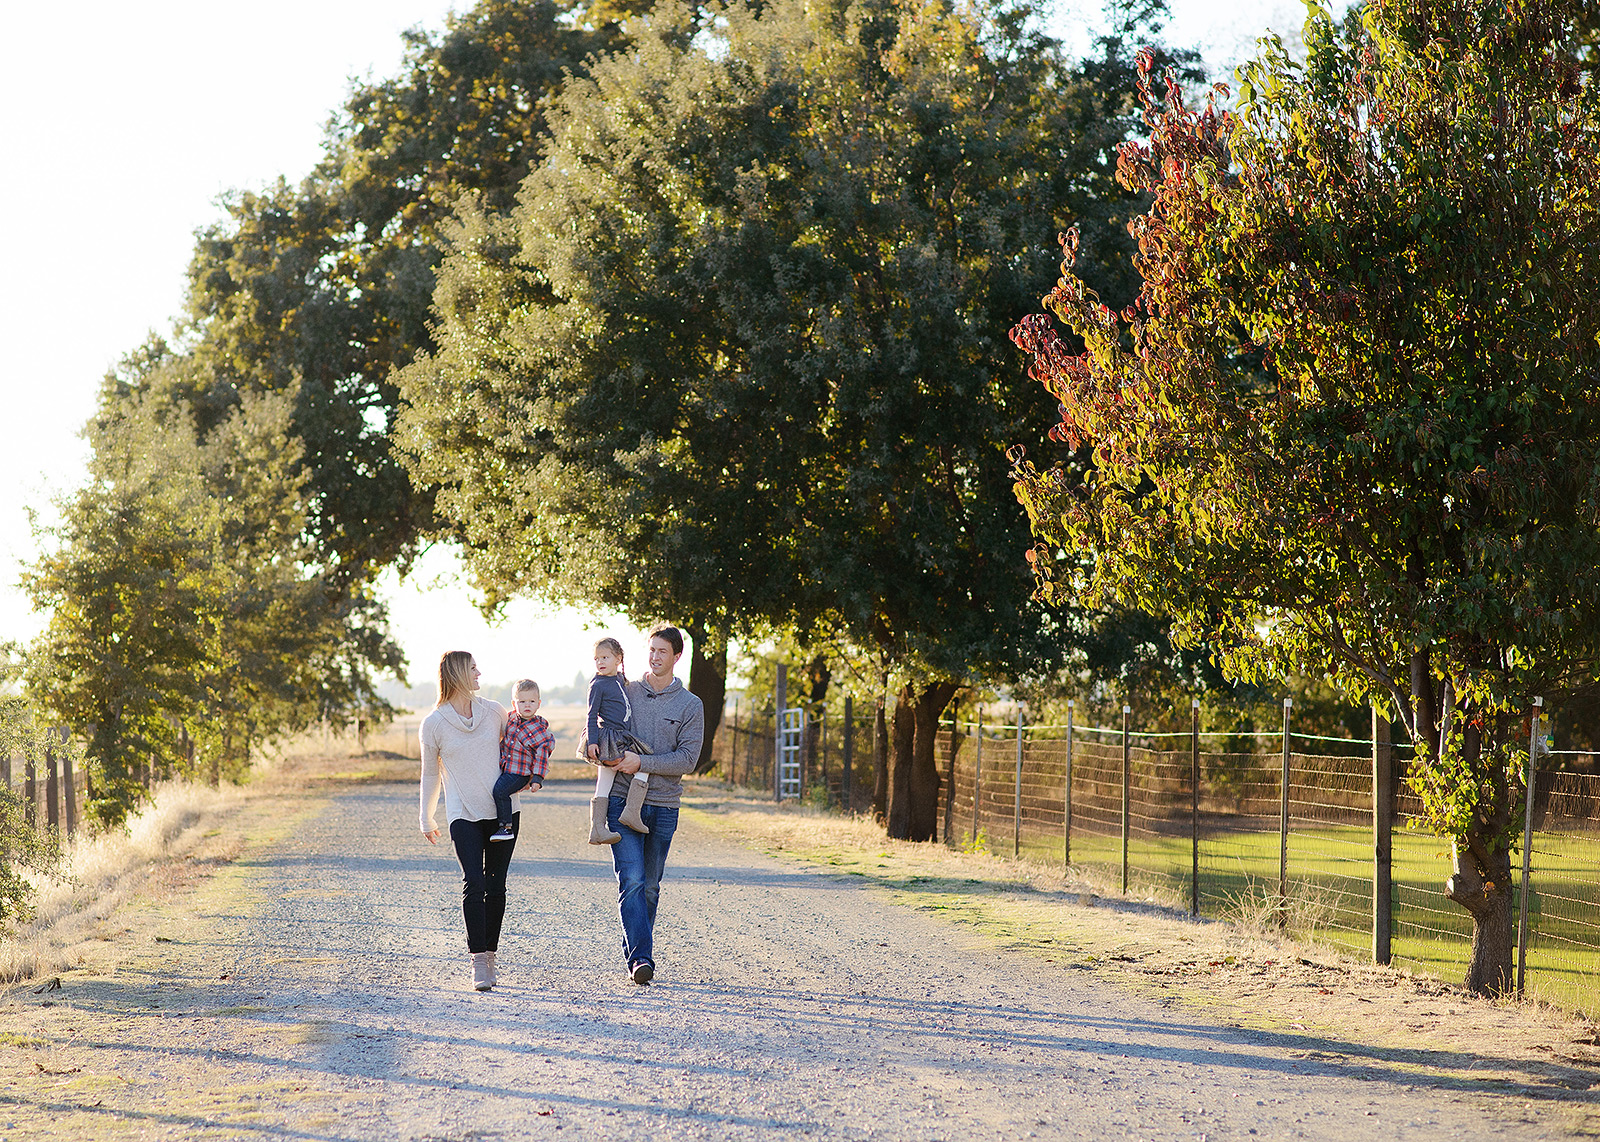 gibson ranch family portraits for fall photos with photographer jill carmel